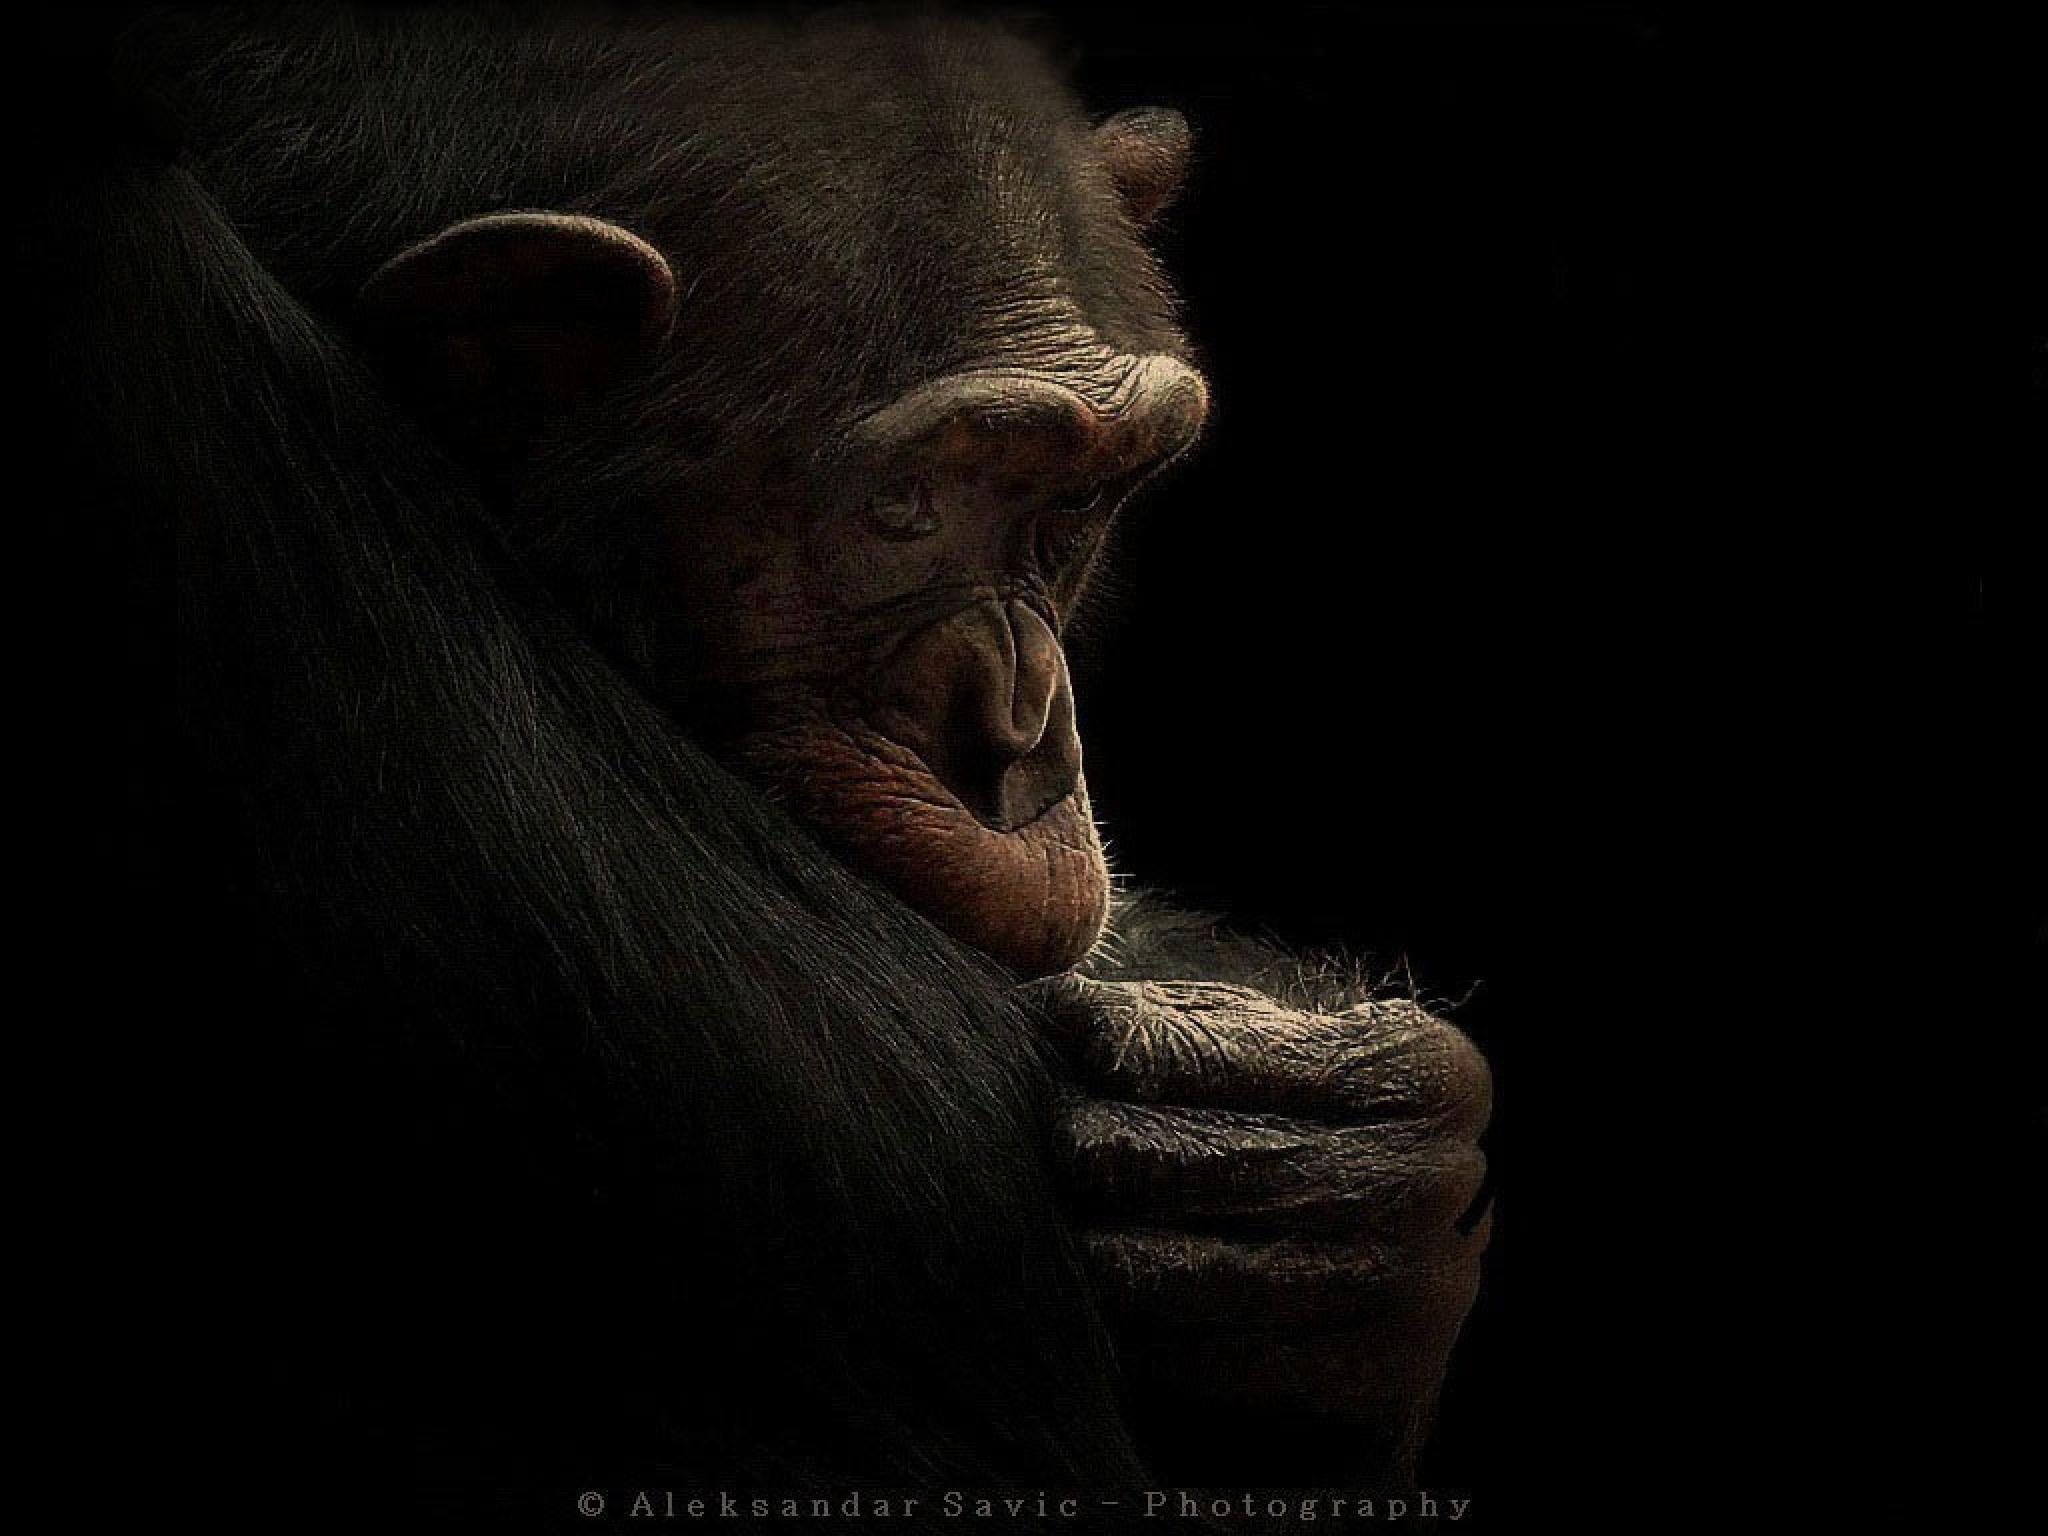 Almost Human by Aleksandar Savic